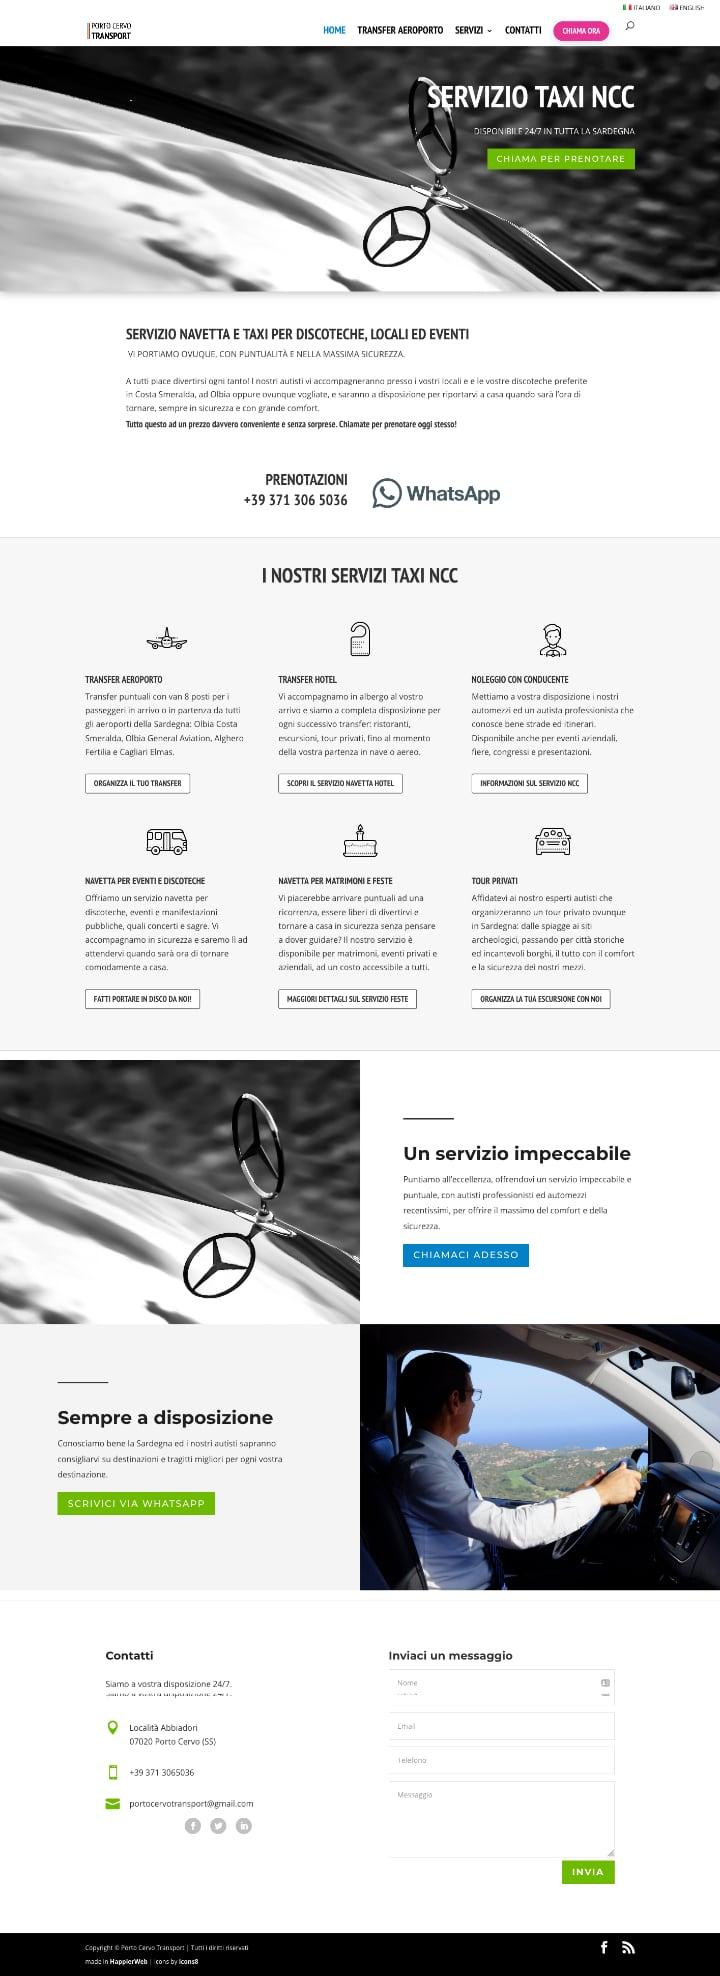 Porto Cervo Taxi Service Chauffeur site screenshot